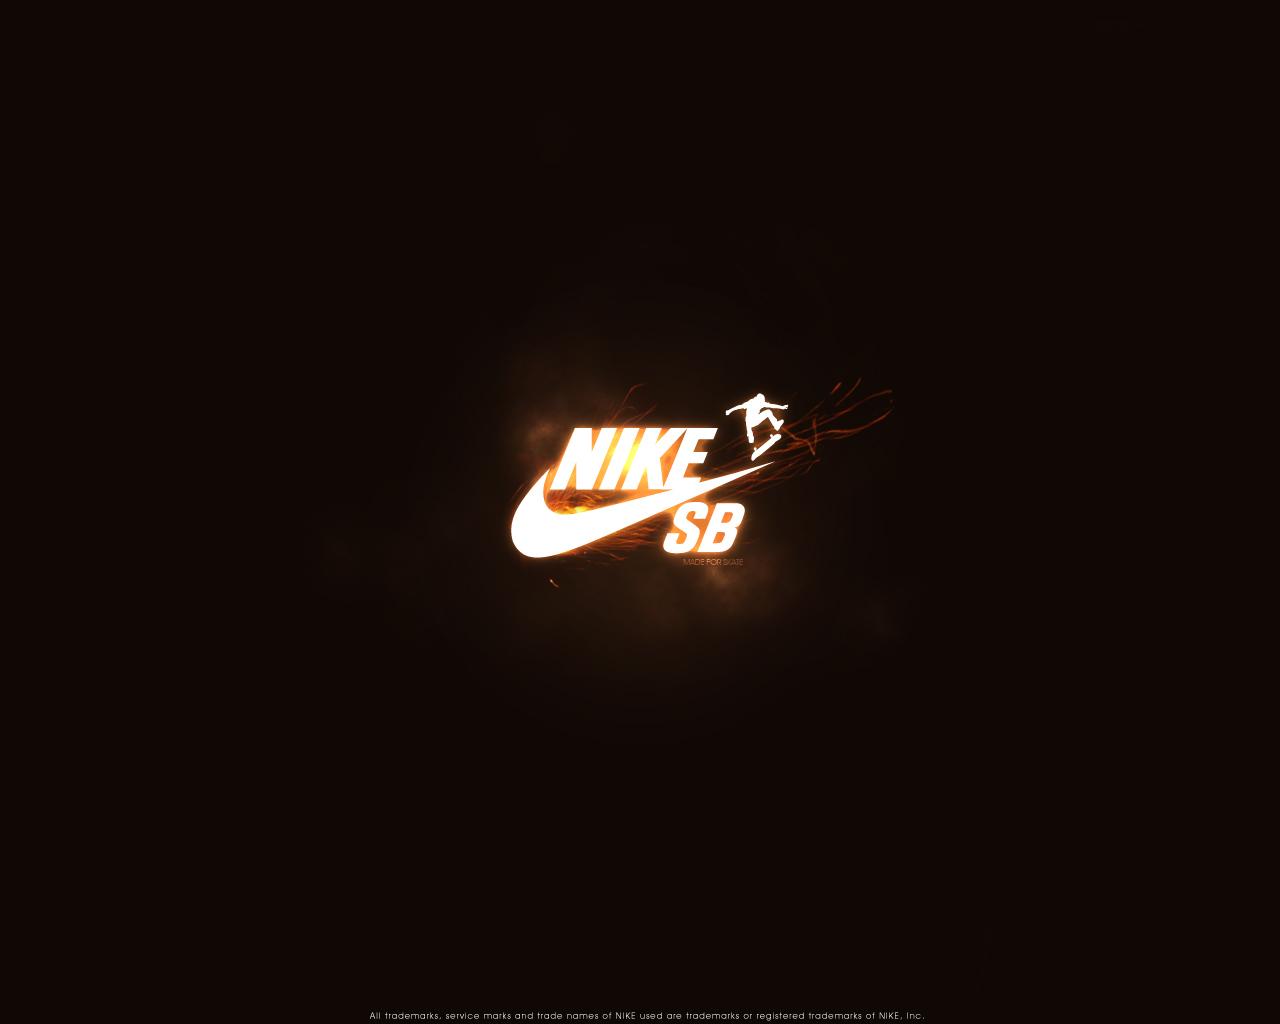 Free Download Nike Sb Wallpaper By Jnusjnus 1280x1024 For Your